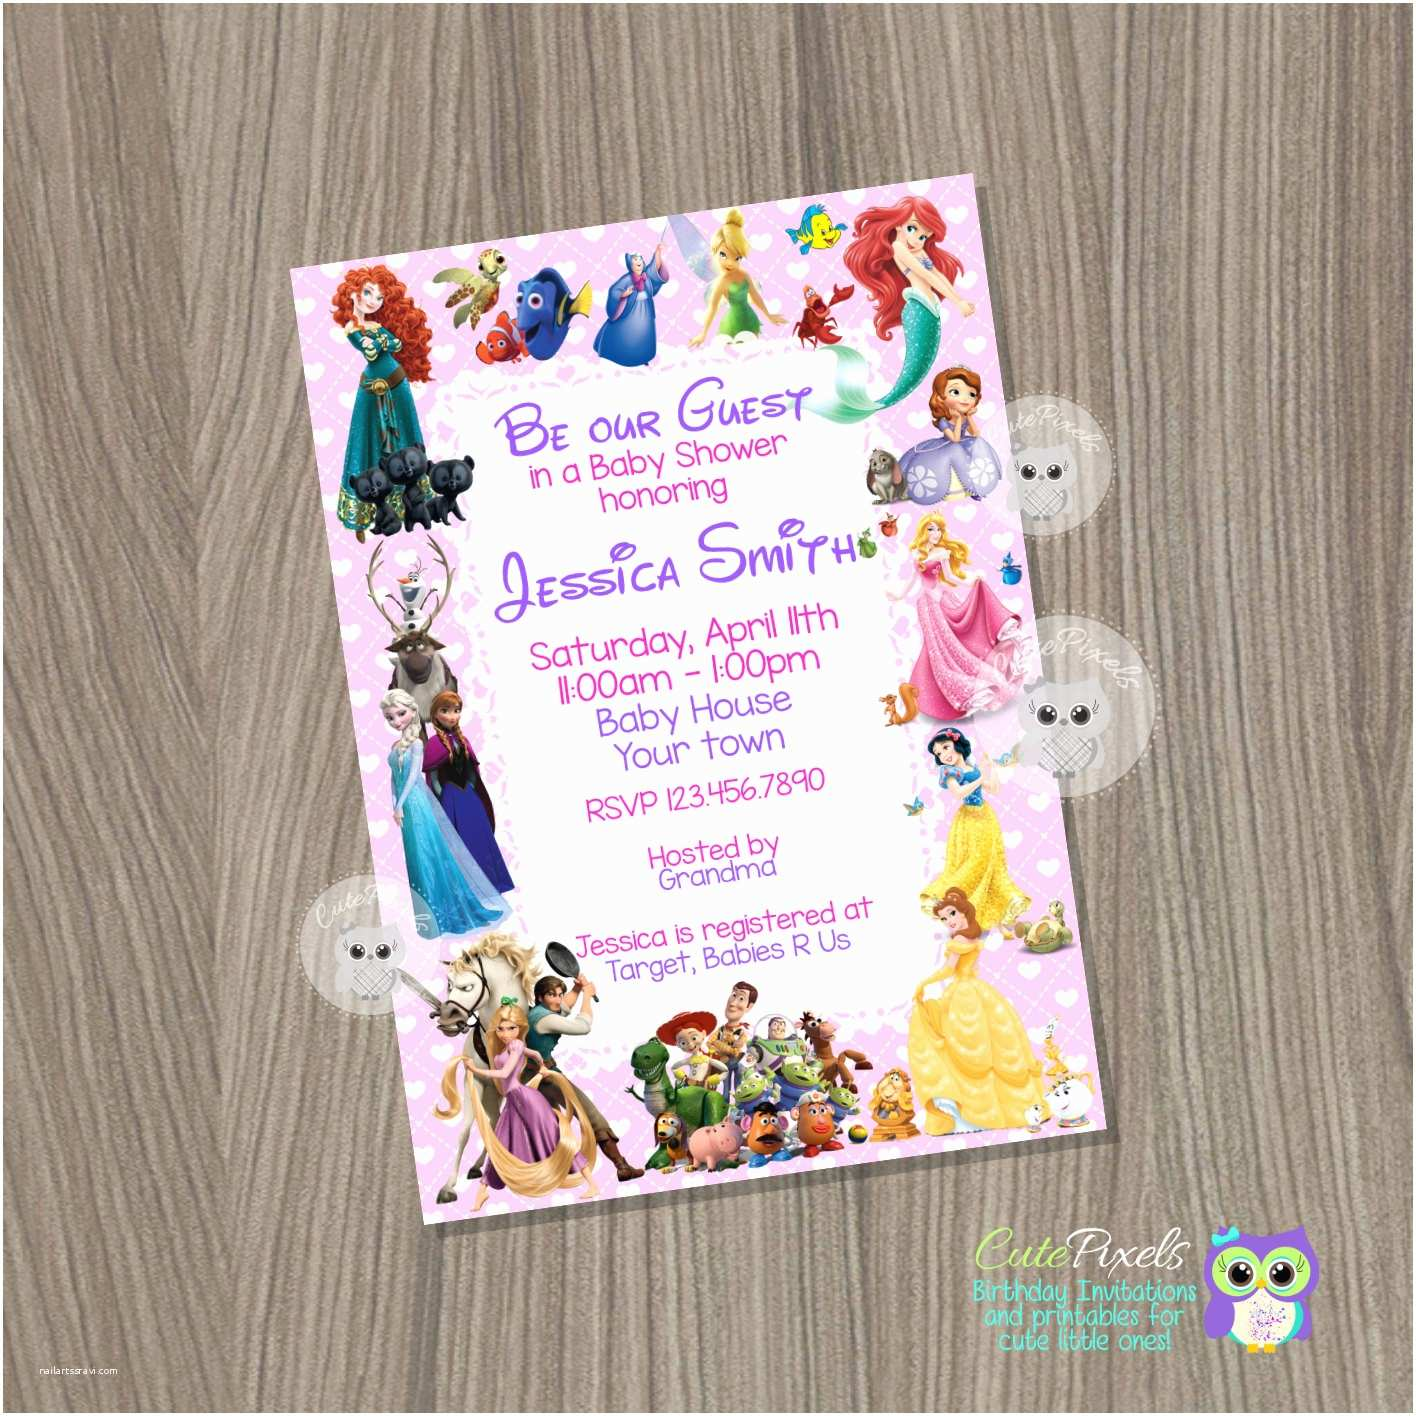 Disney Baby Shower Invitations Baby Shower Invitation for Girl Disney Baby Shower Baby Girl